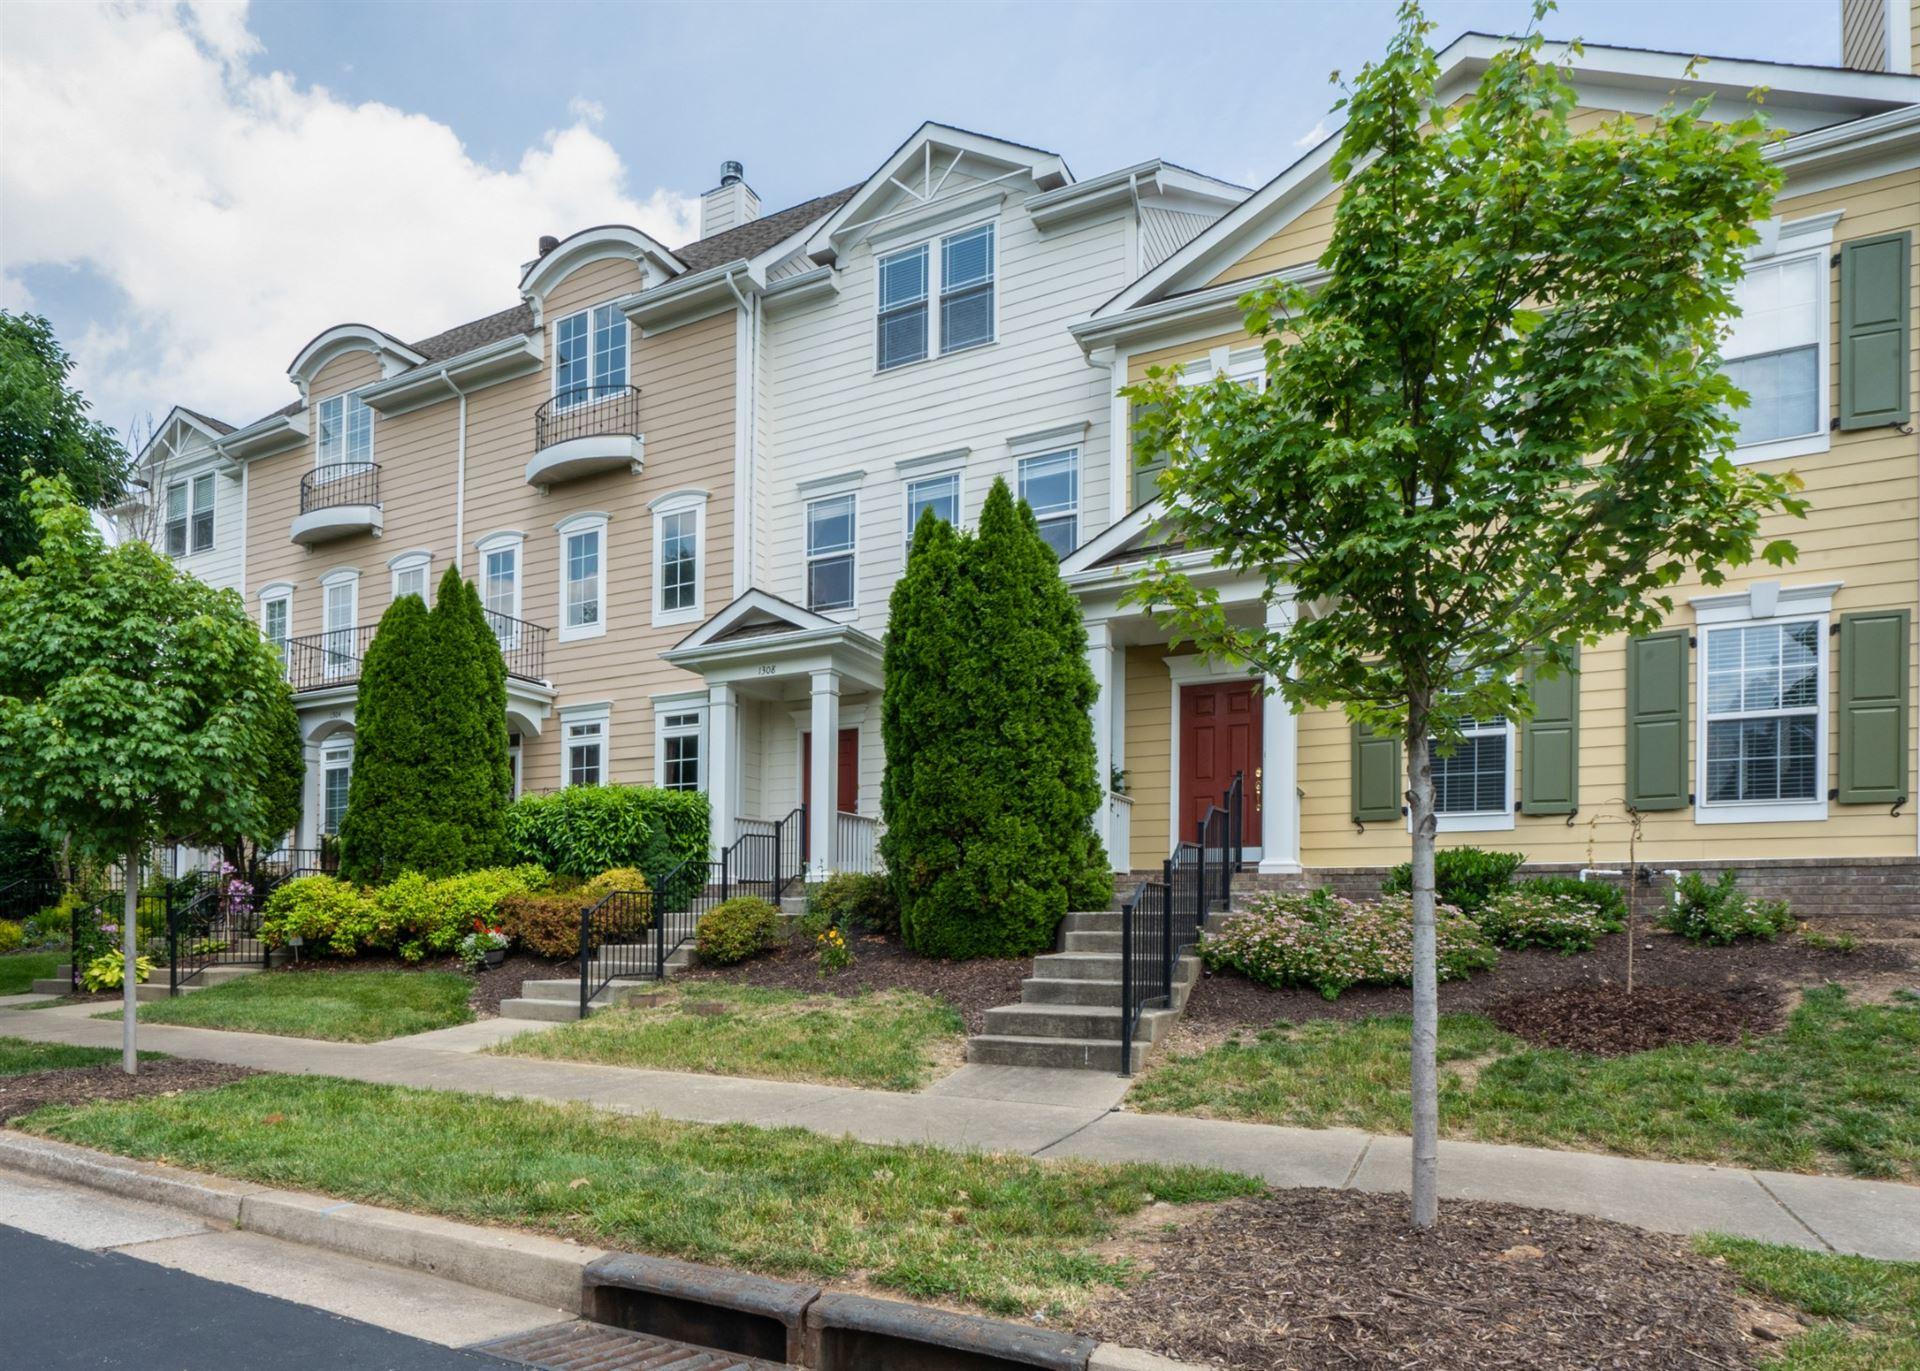 1308 Trenton Ln, Franklin, TN 37067 - MLS#: 2256565